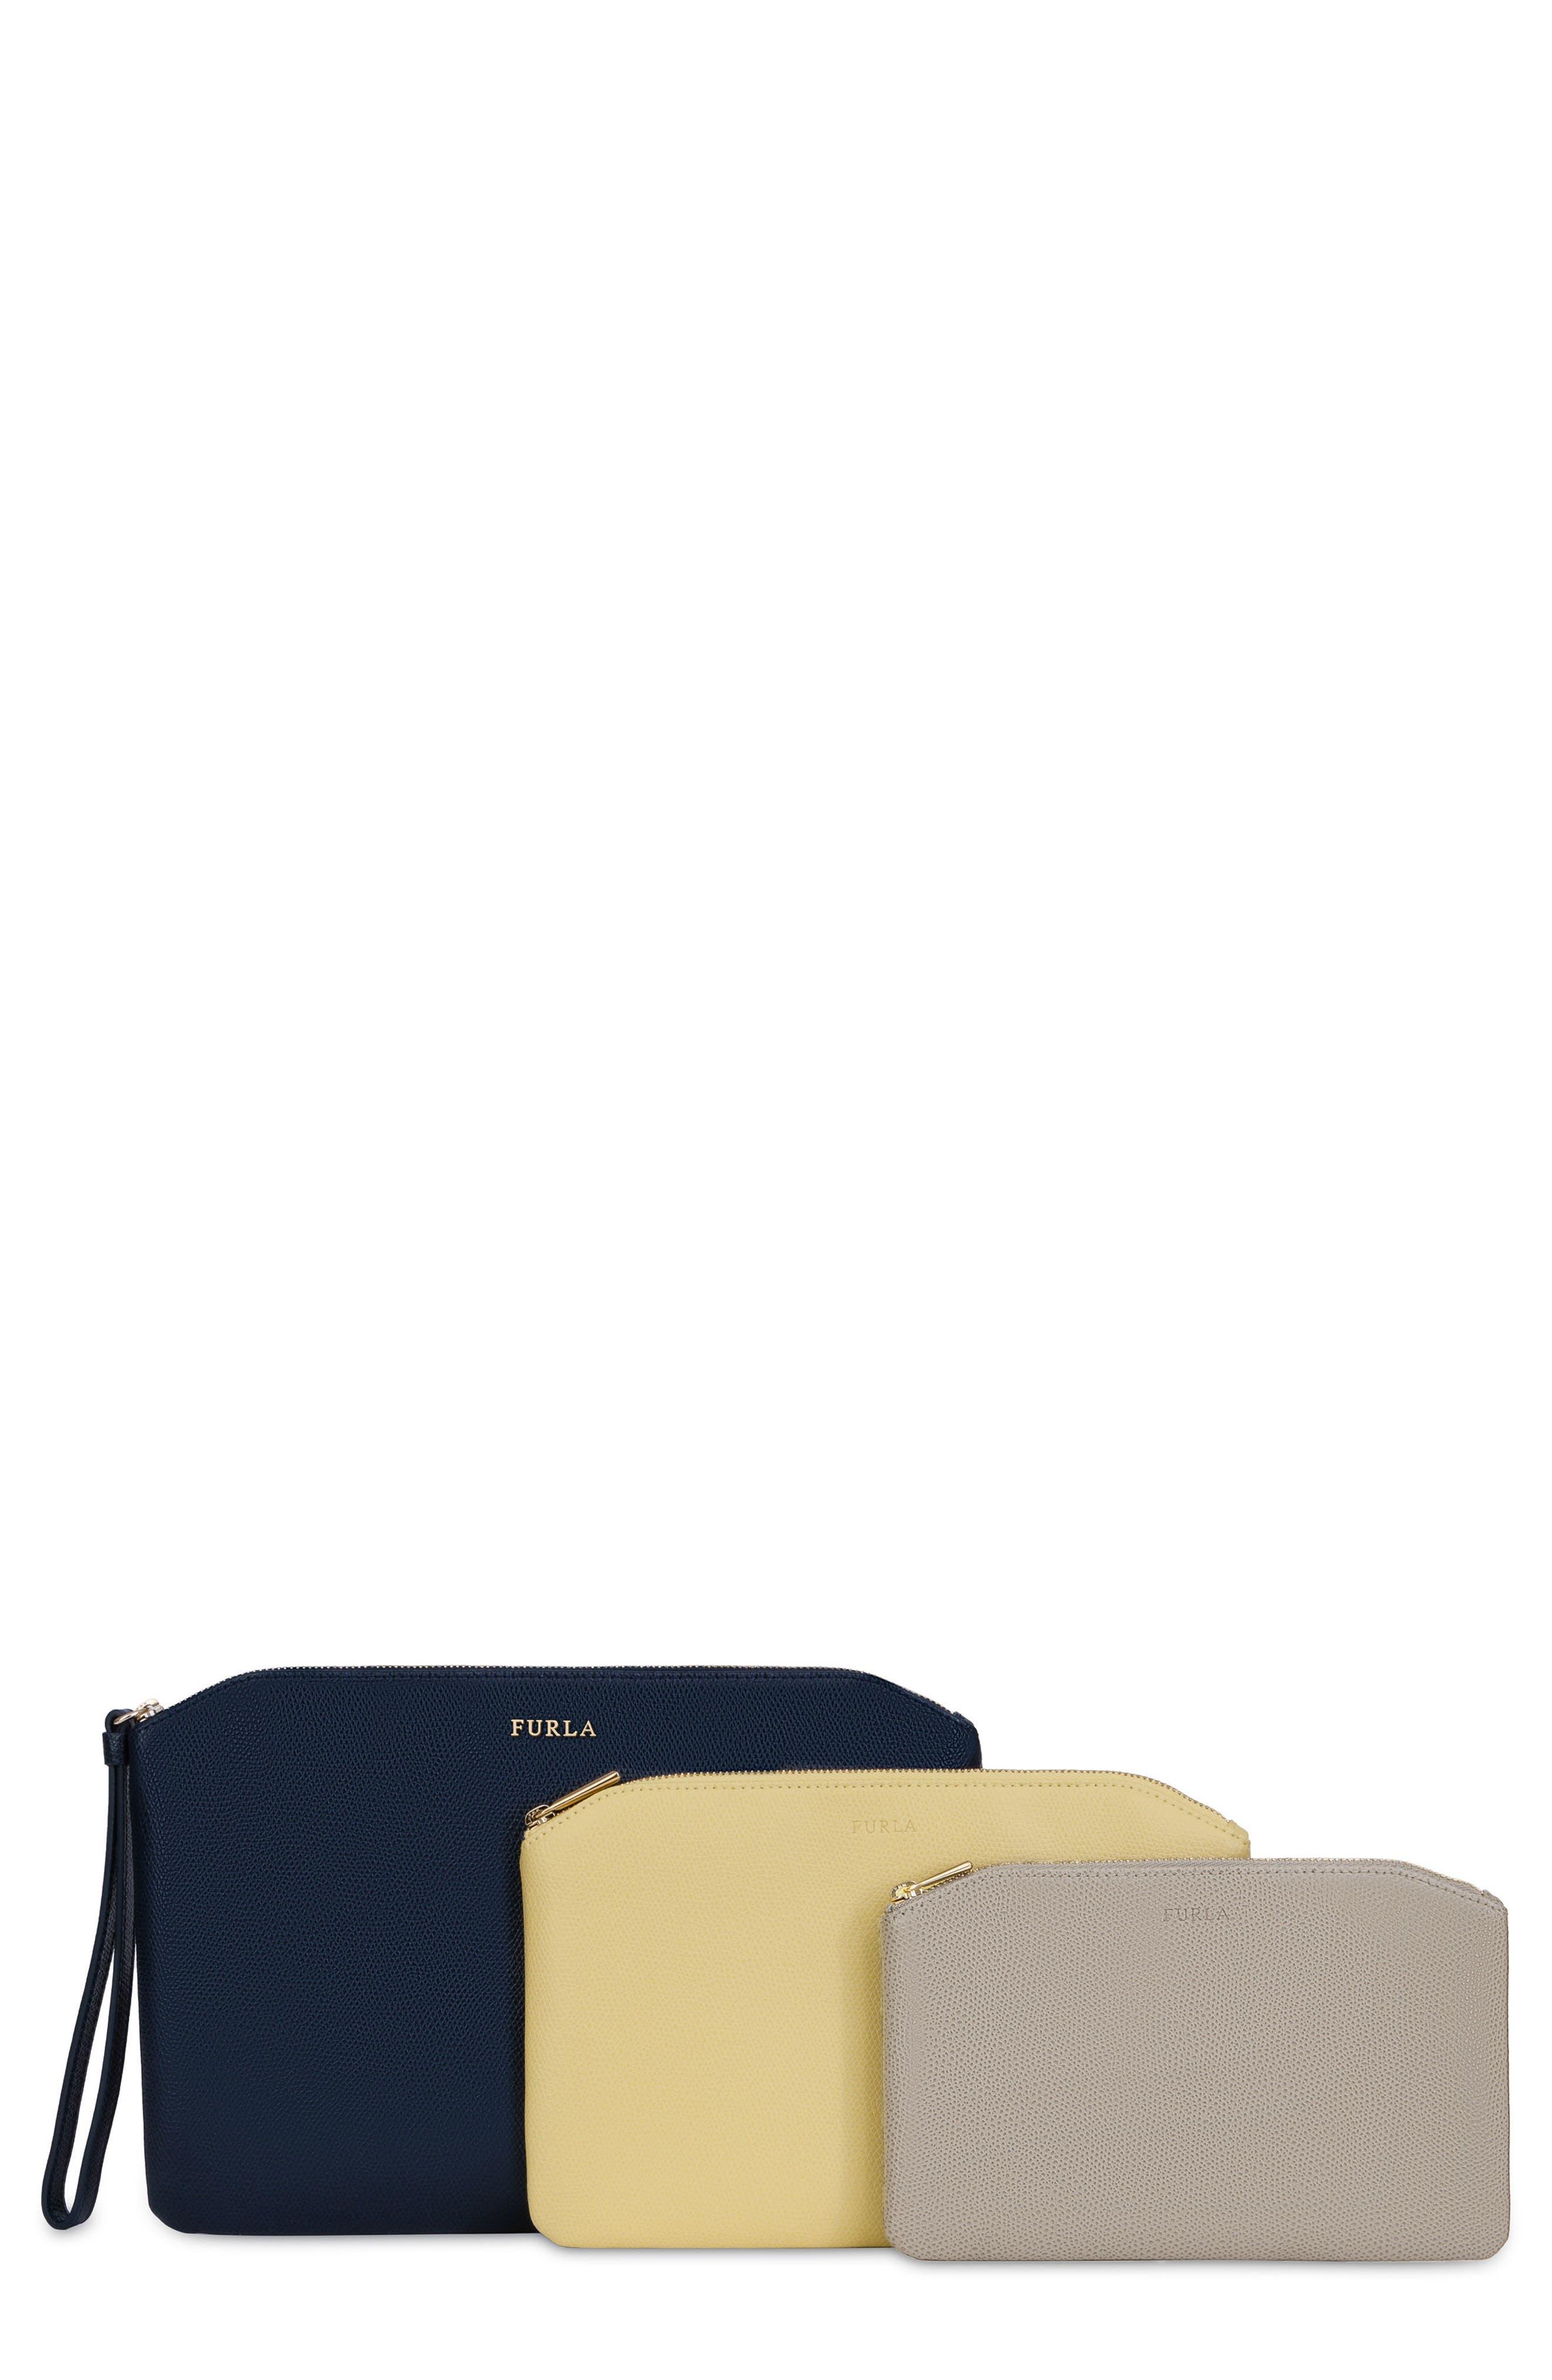 Venere Set of 3 Leather Cosmetic Bags,                             Main thumbnail 1, color,                             Blu/ Cedro/ Sabbia